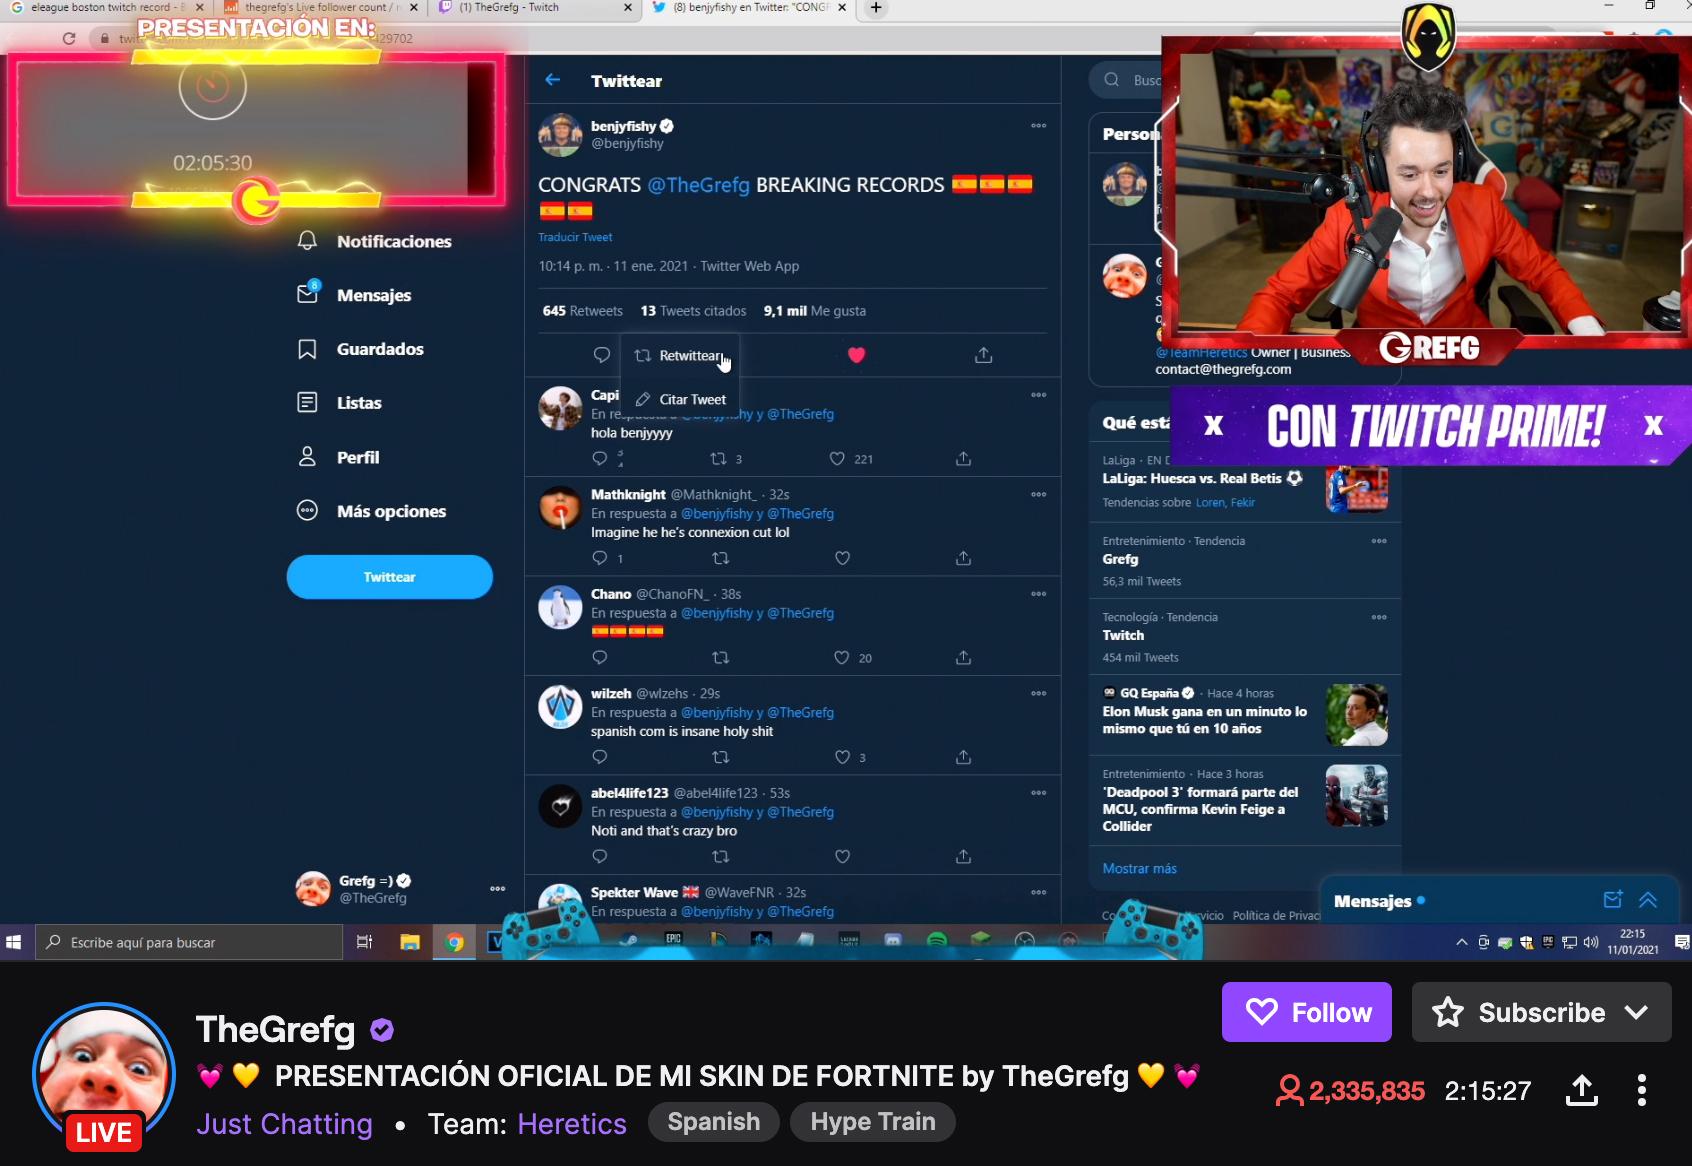 TheGrefg Twitch viewership